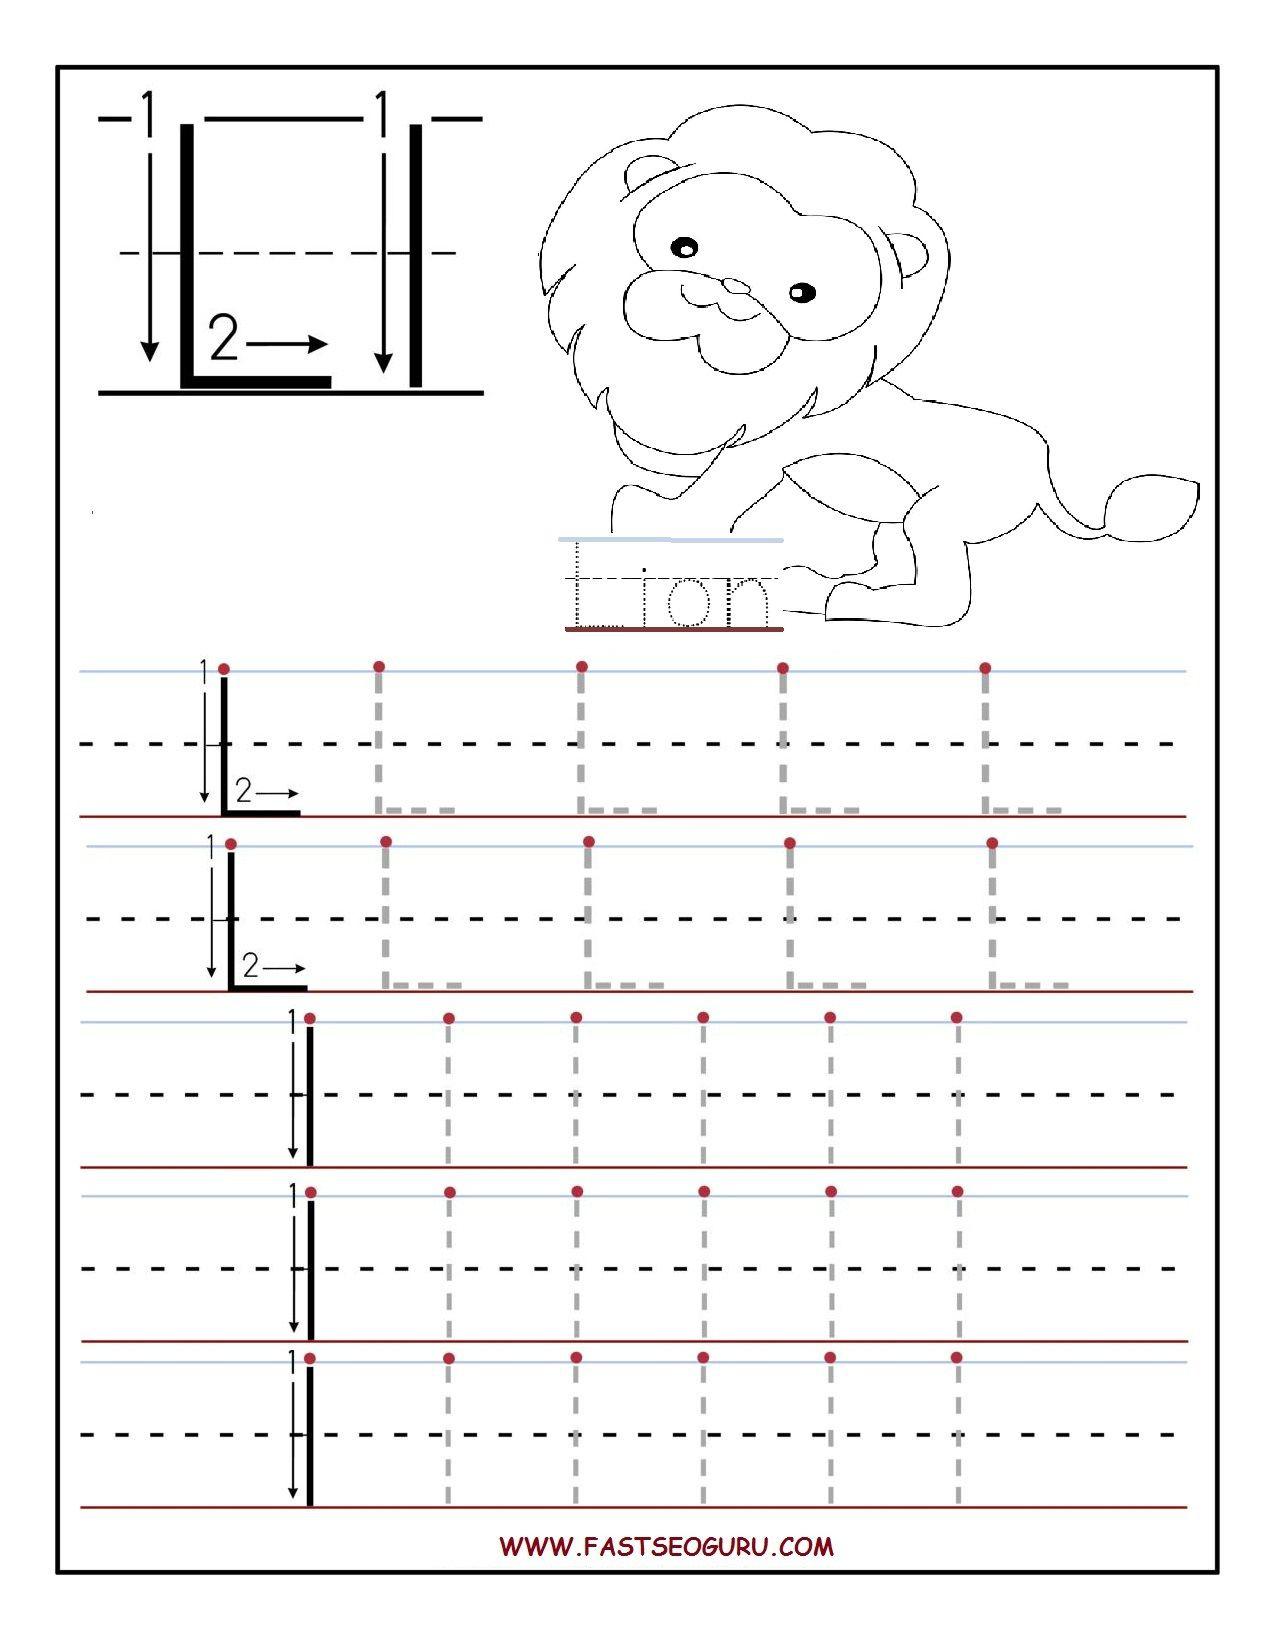 Printable Letter L Tracing Worksheets For Preschool inside Large Tracing Letters For Preschoolers